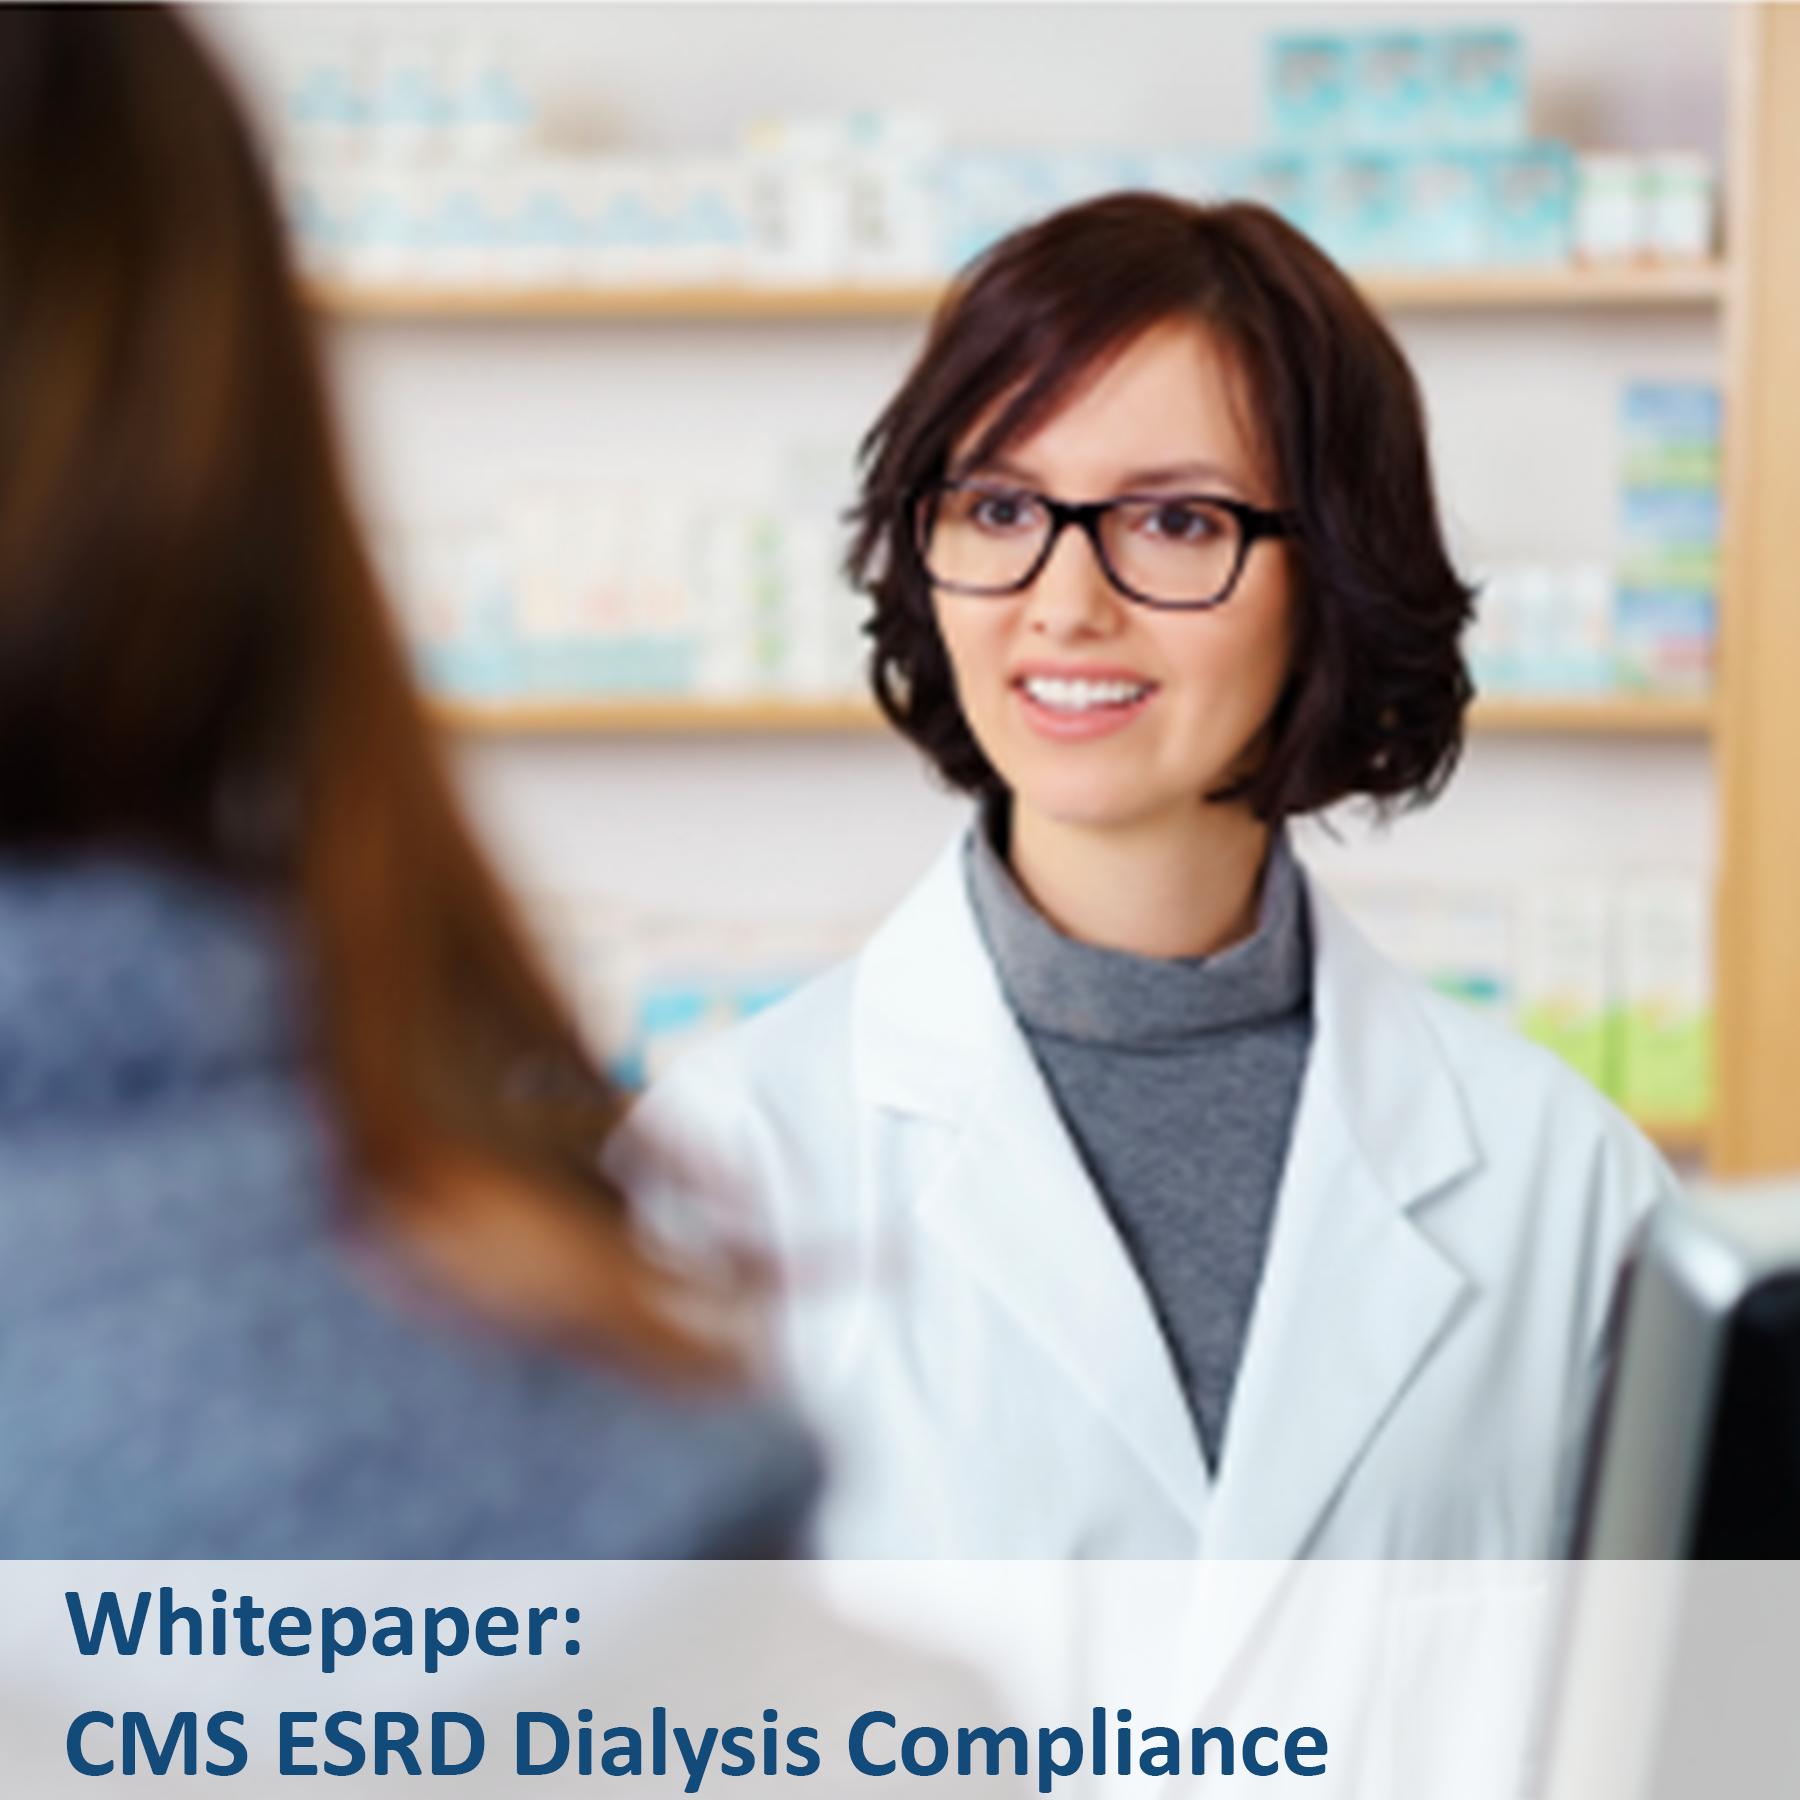 Whitepaper - ESRD Dialysis Compliance